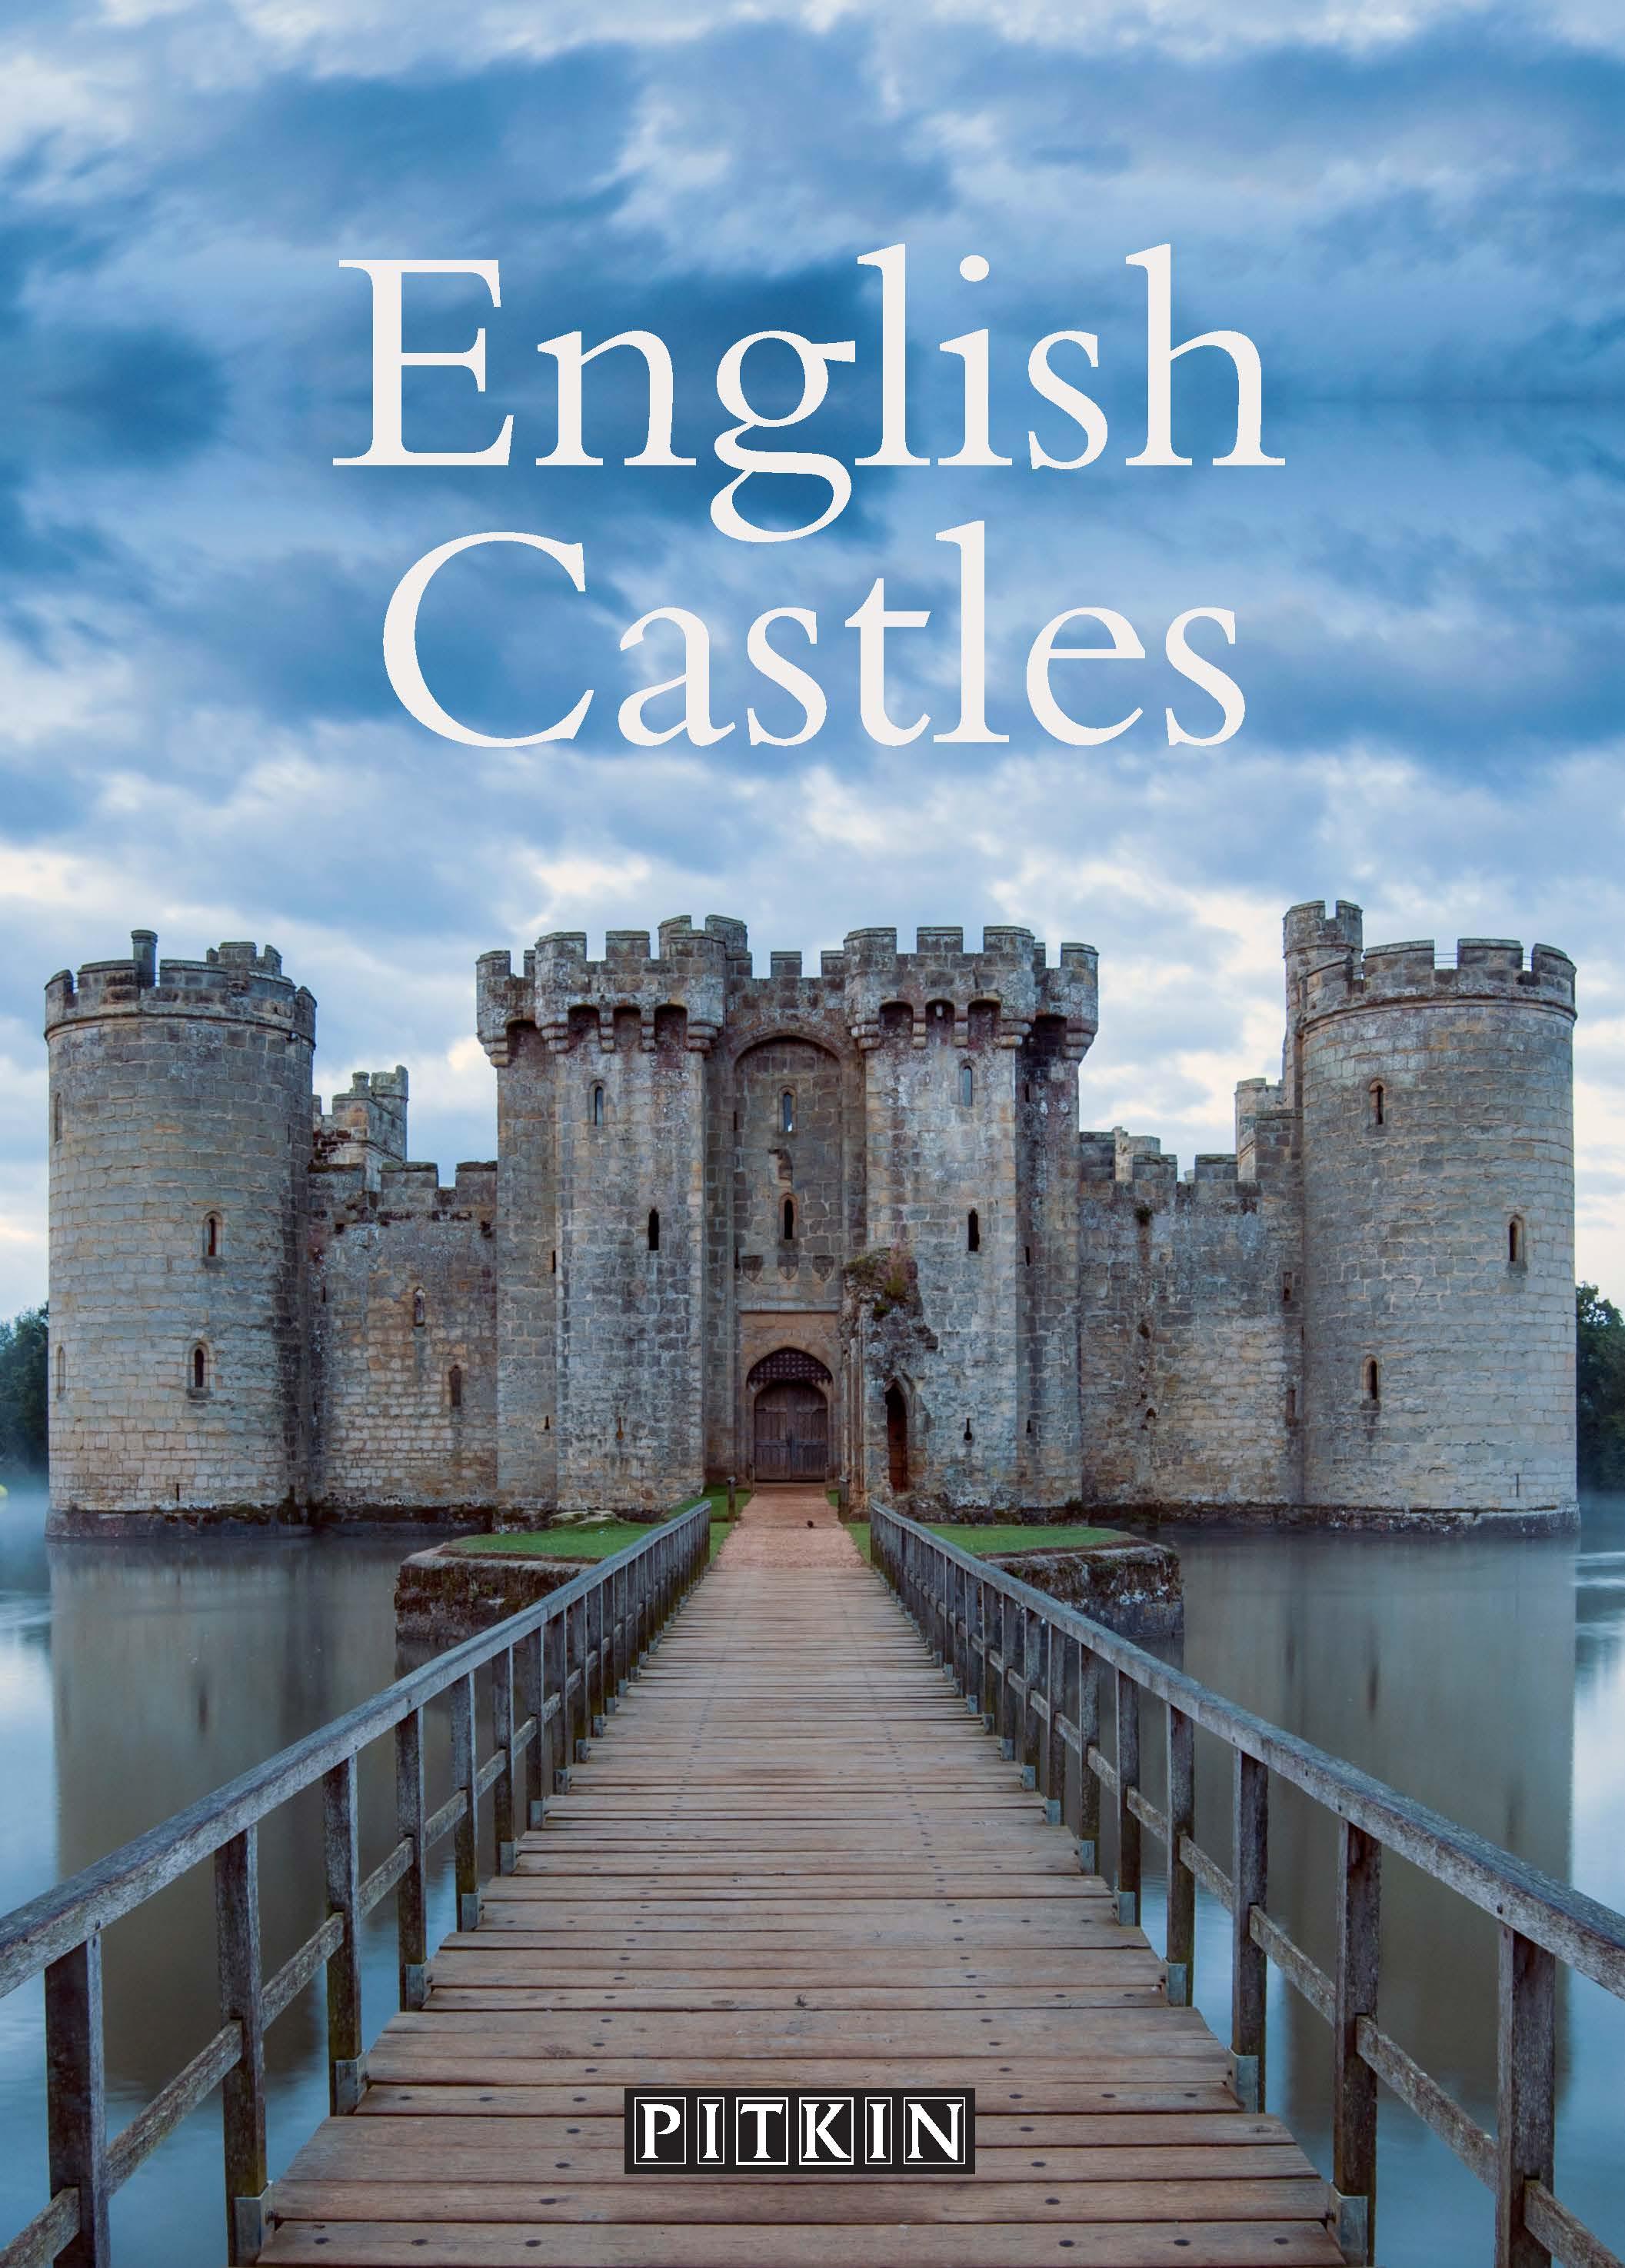 English Castles